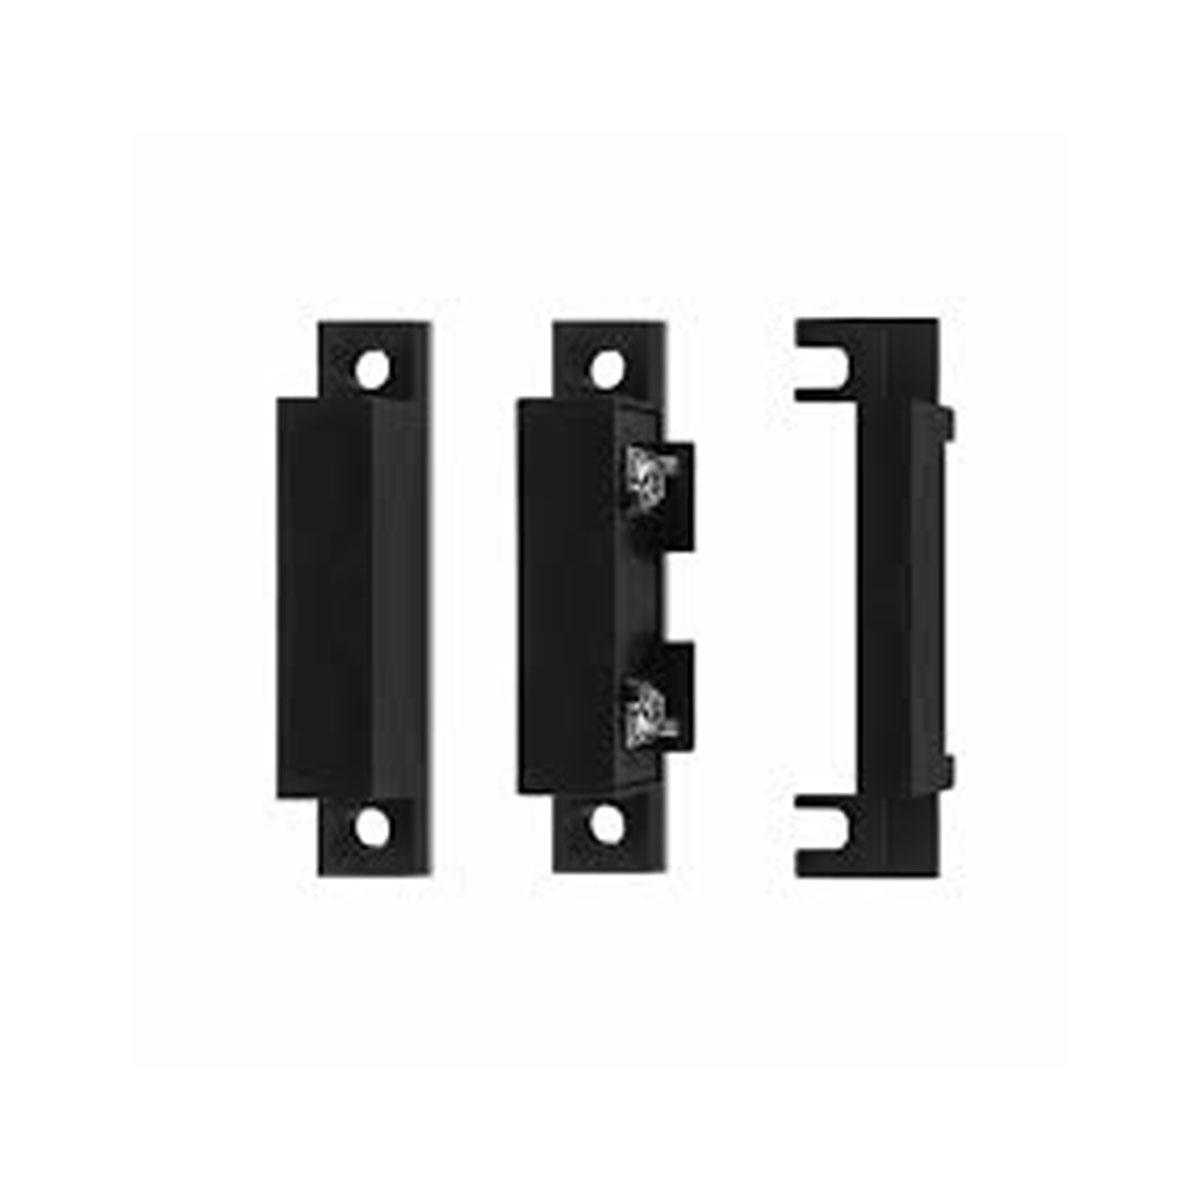 Kit 05 Sensor Magnético Intelbras Xas Connect Black